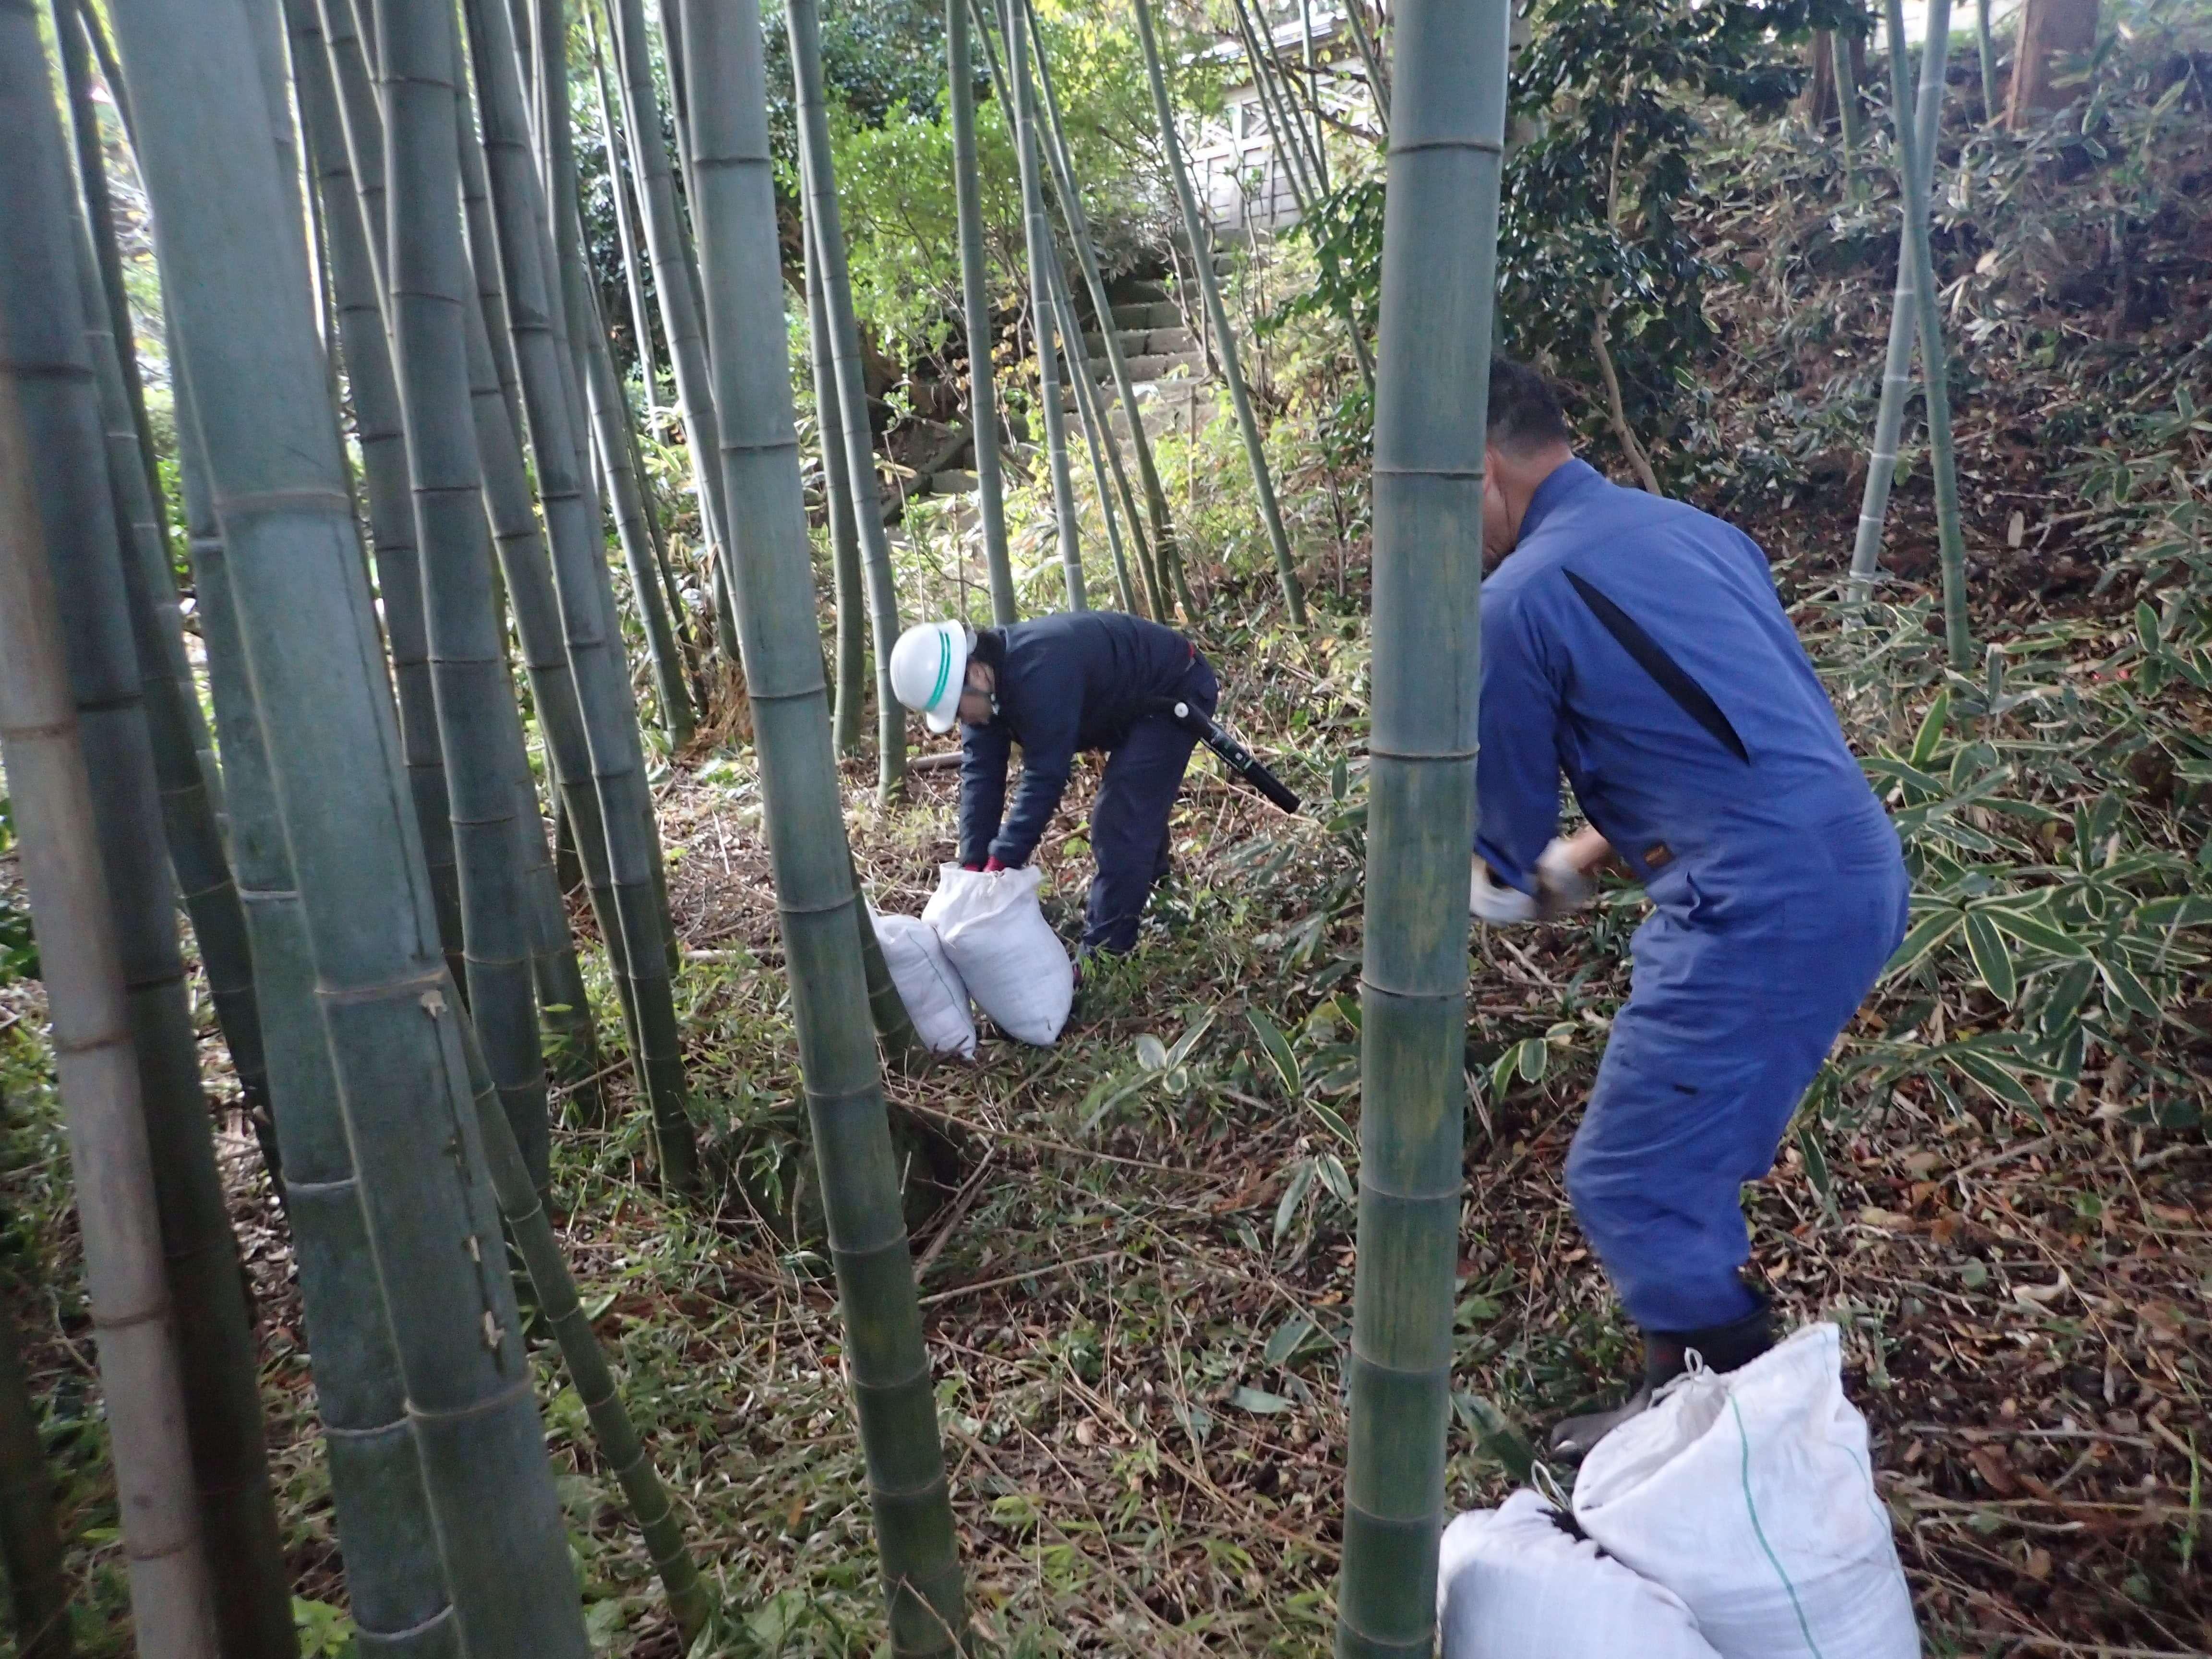 Image of 北海道松前町法幢寺での孟宗竹林での間伐等 6